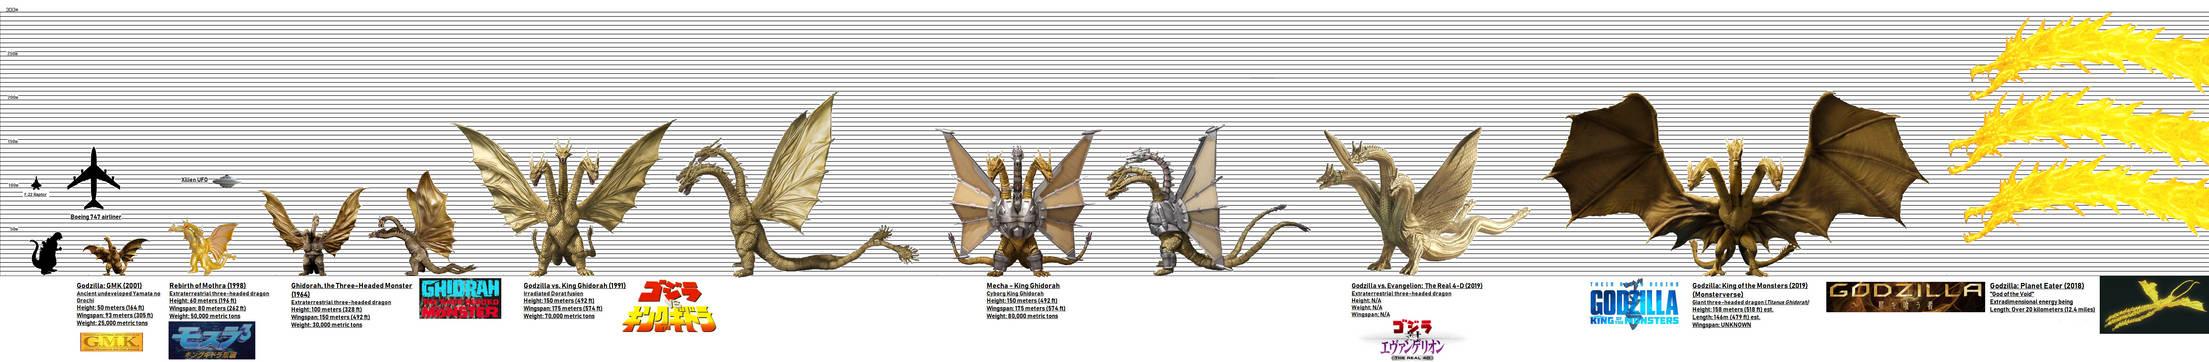 KING GHIDORAH Evolutionary Size Chart